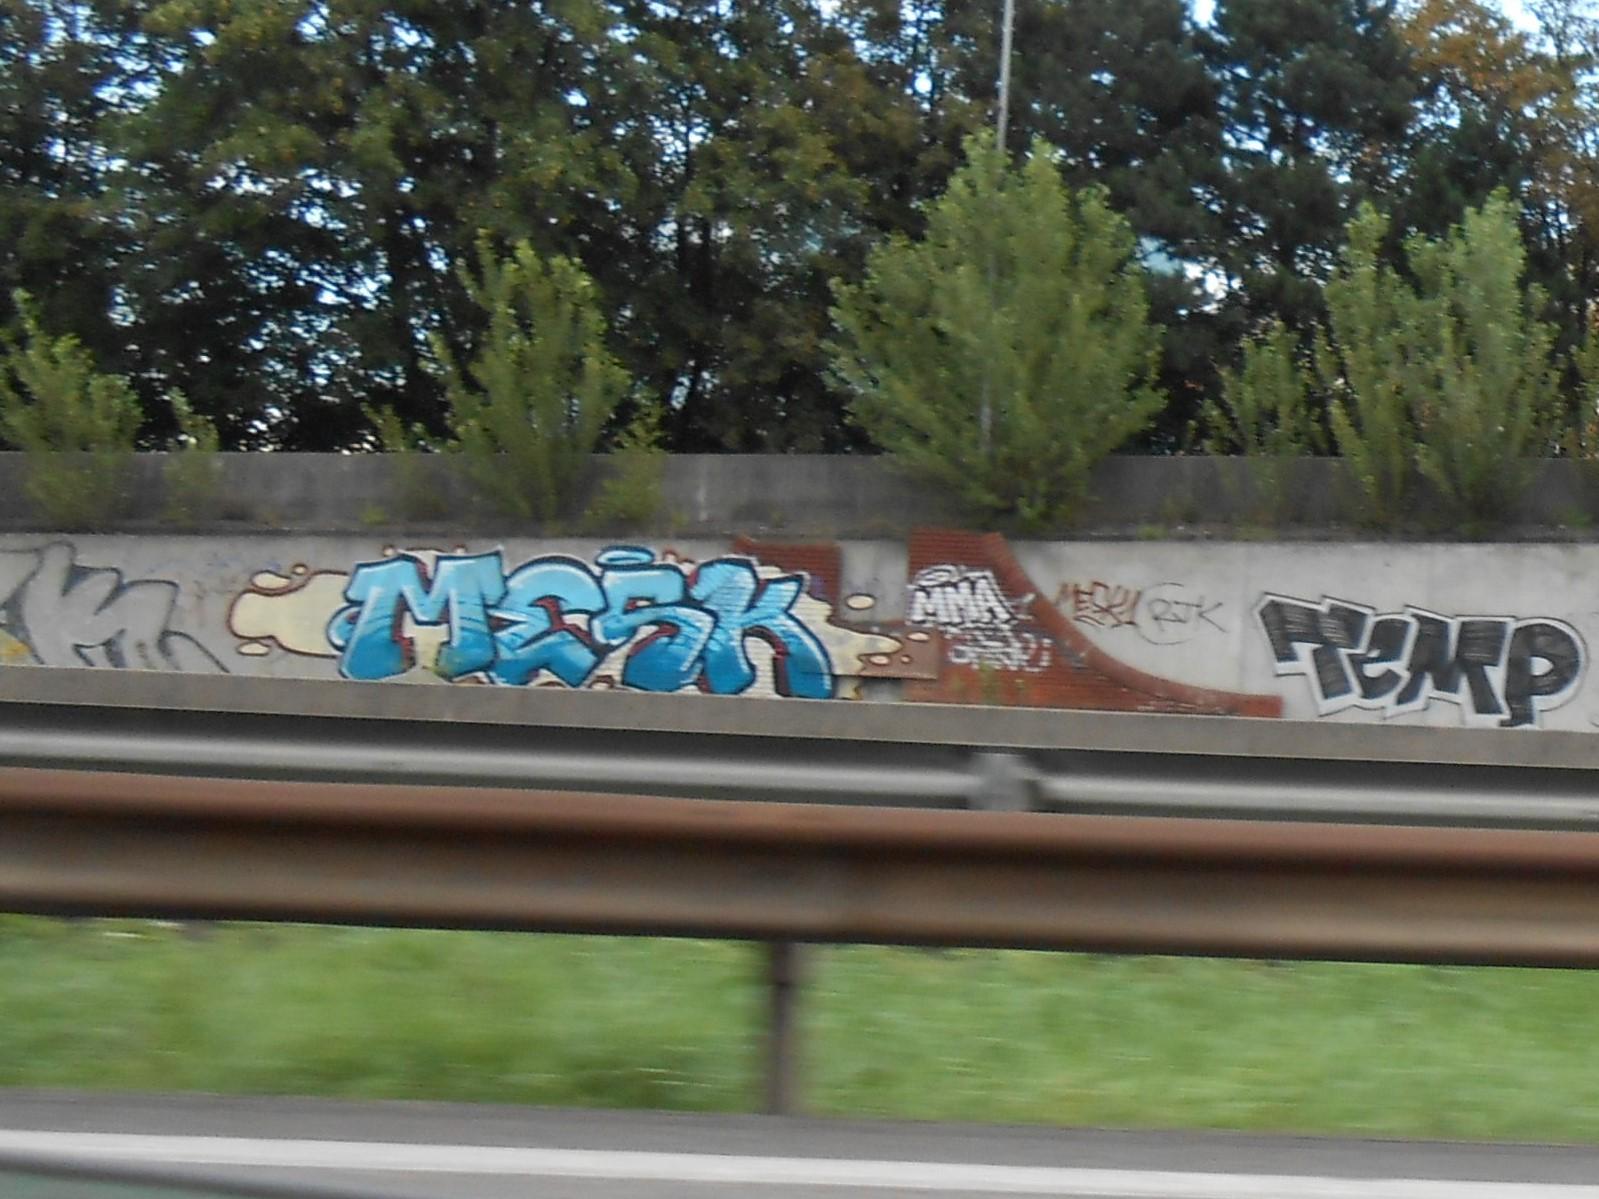 graffiti_aout_2014_strasbourg_Mesk,MMA